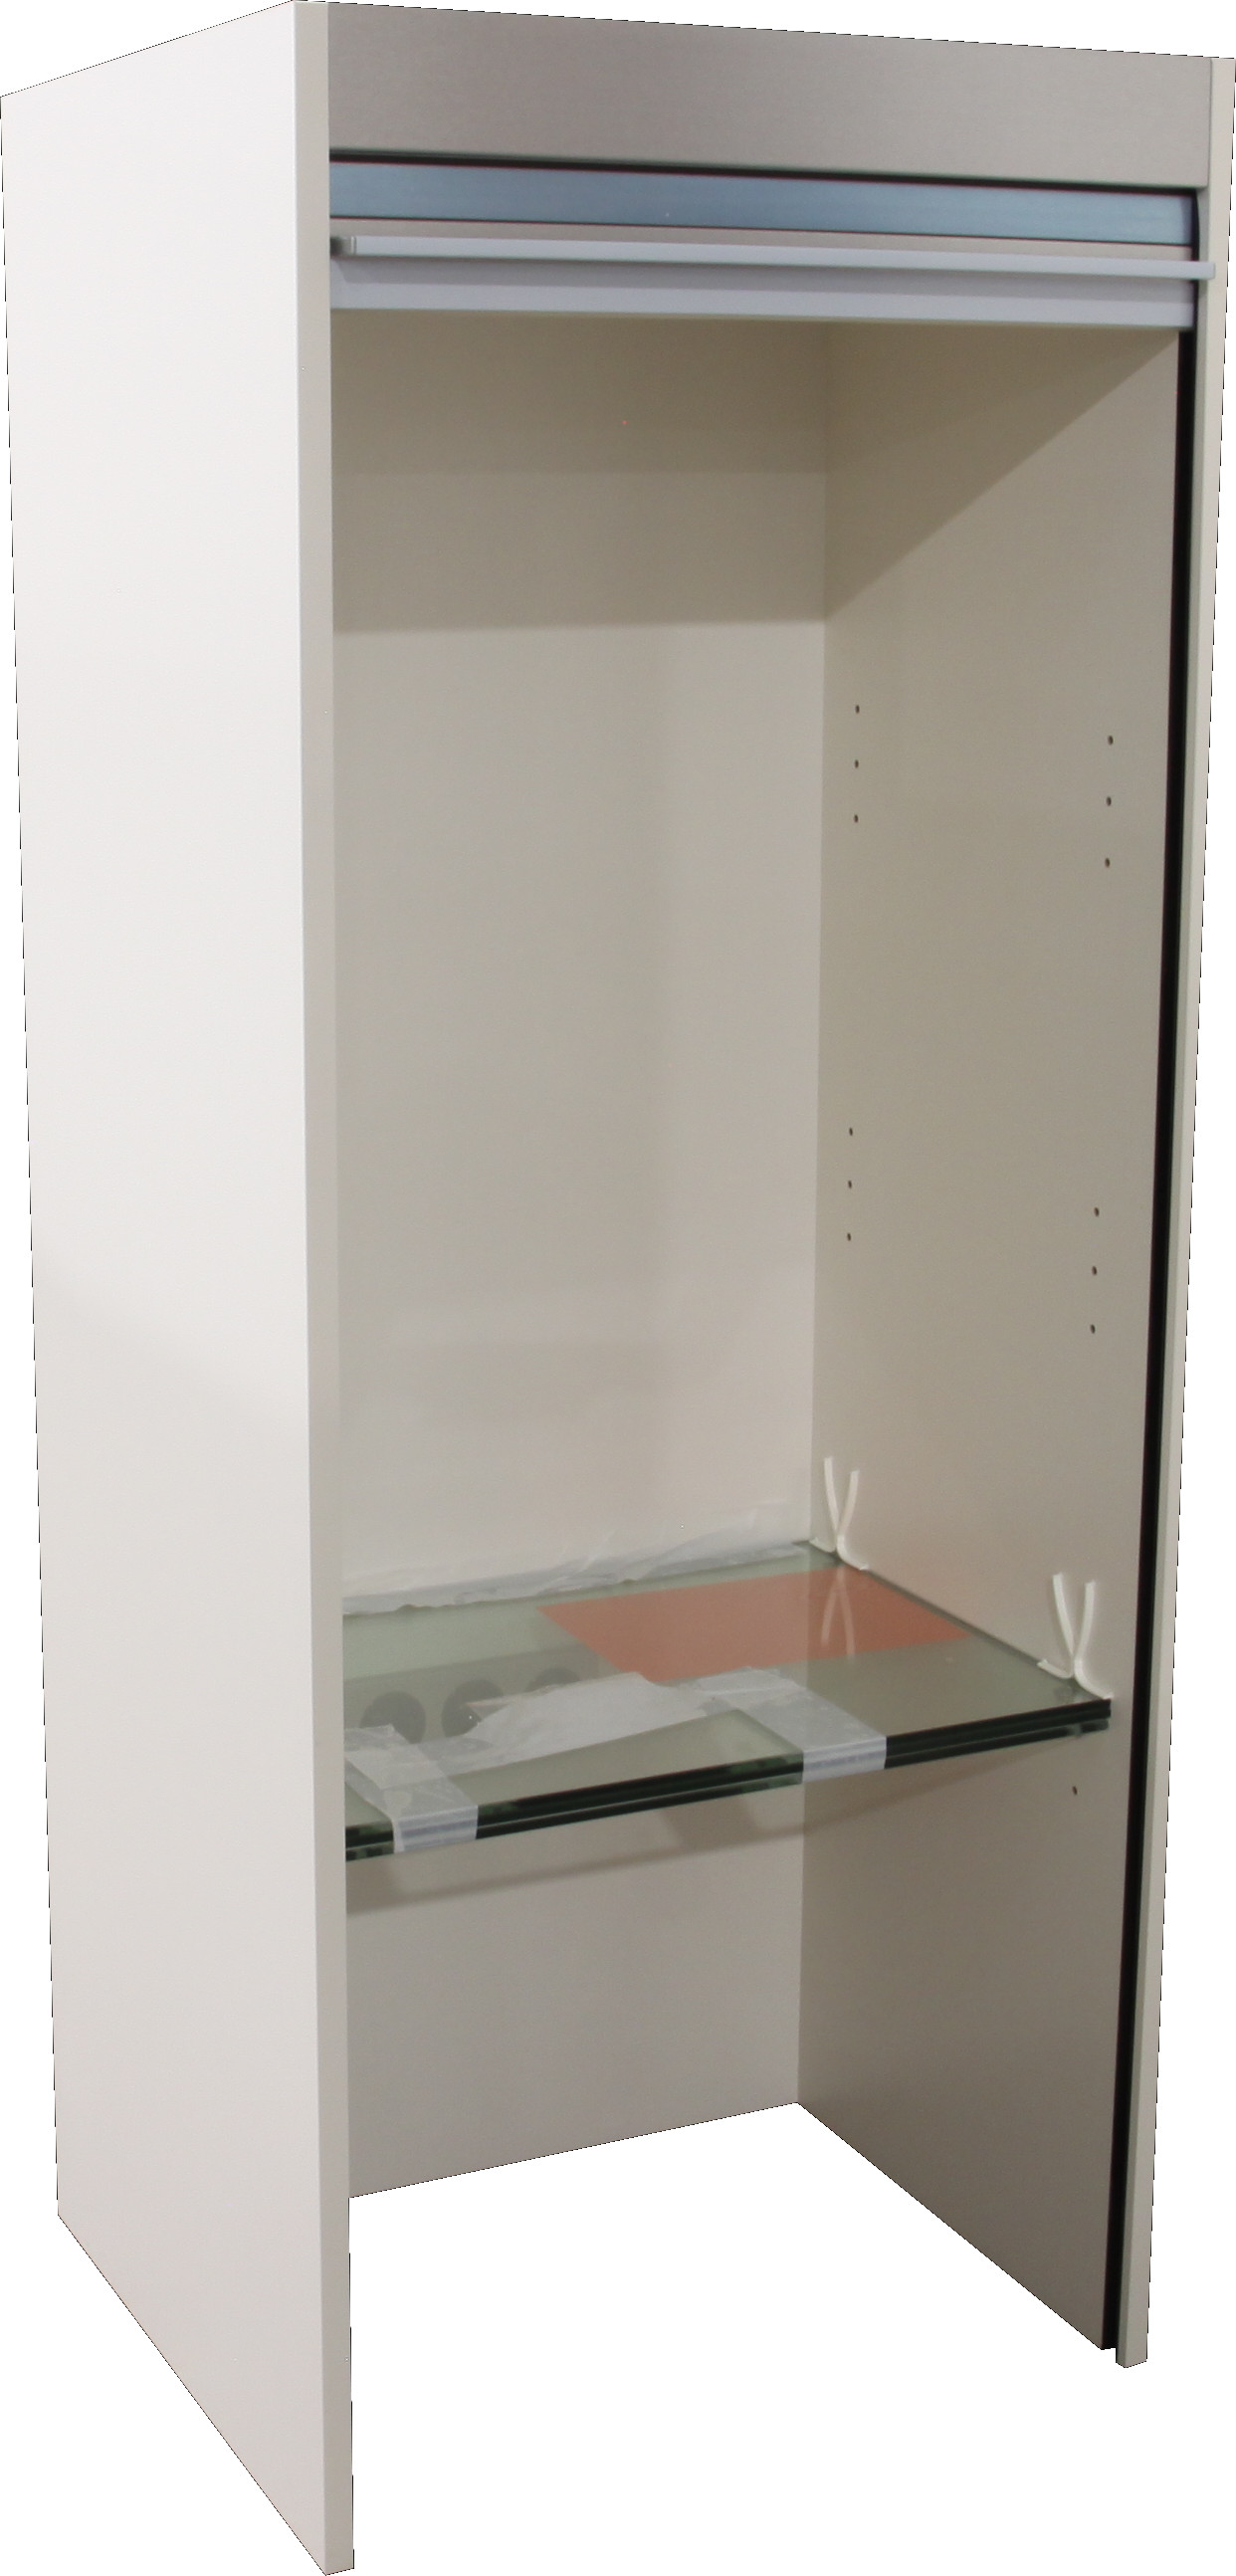 jalousieschrank k che rollladenschrank aufsatz ausstellungsst ck magnolia matt ebay. Black Bedroom Furniture Sets. Home Design Ideas